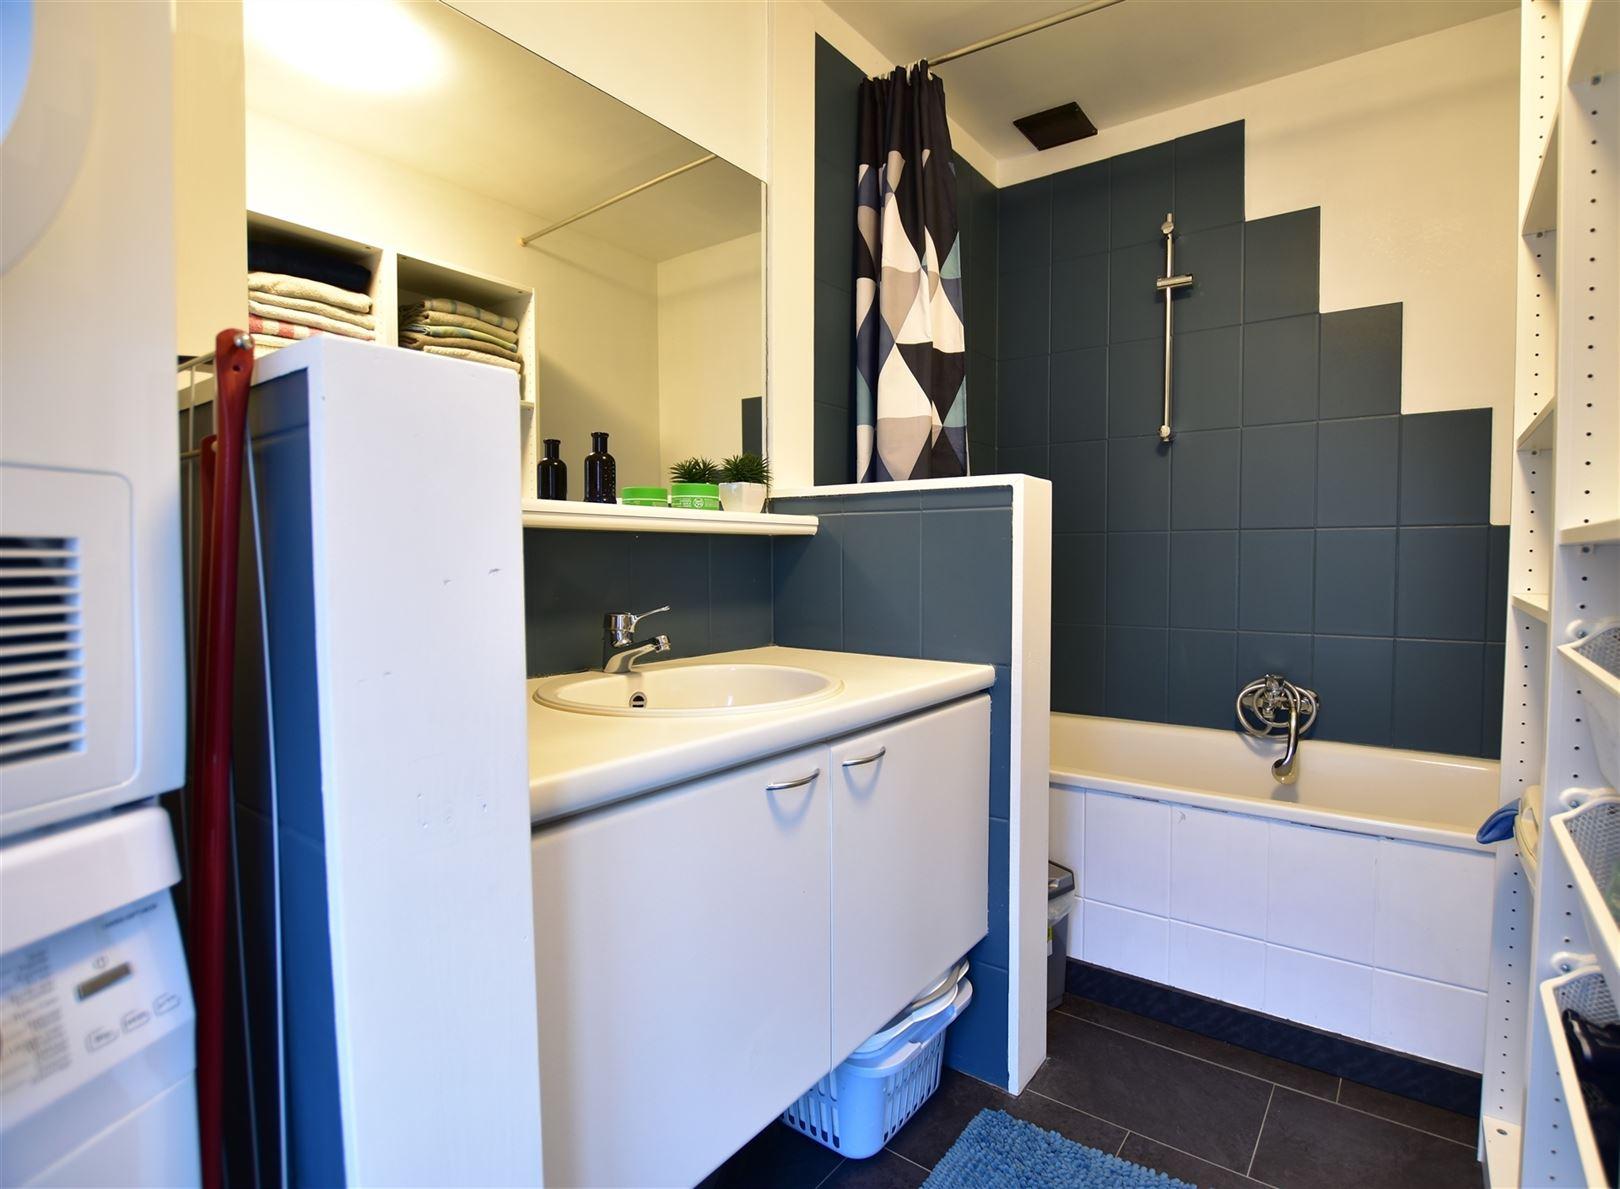 Foto 9 : Duplex/triplex te 9200 BAASRODE (België) - Prijs € 159.000